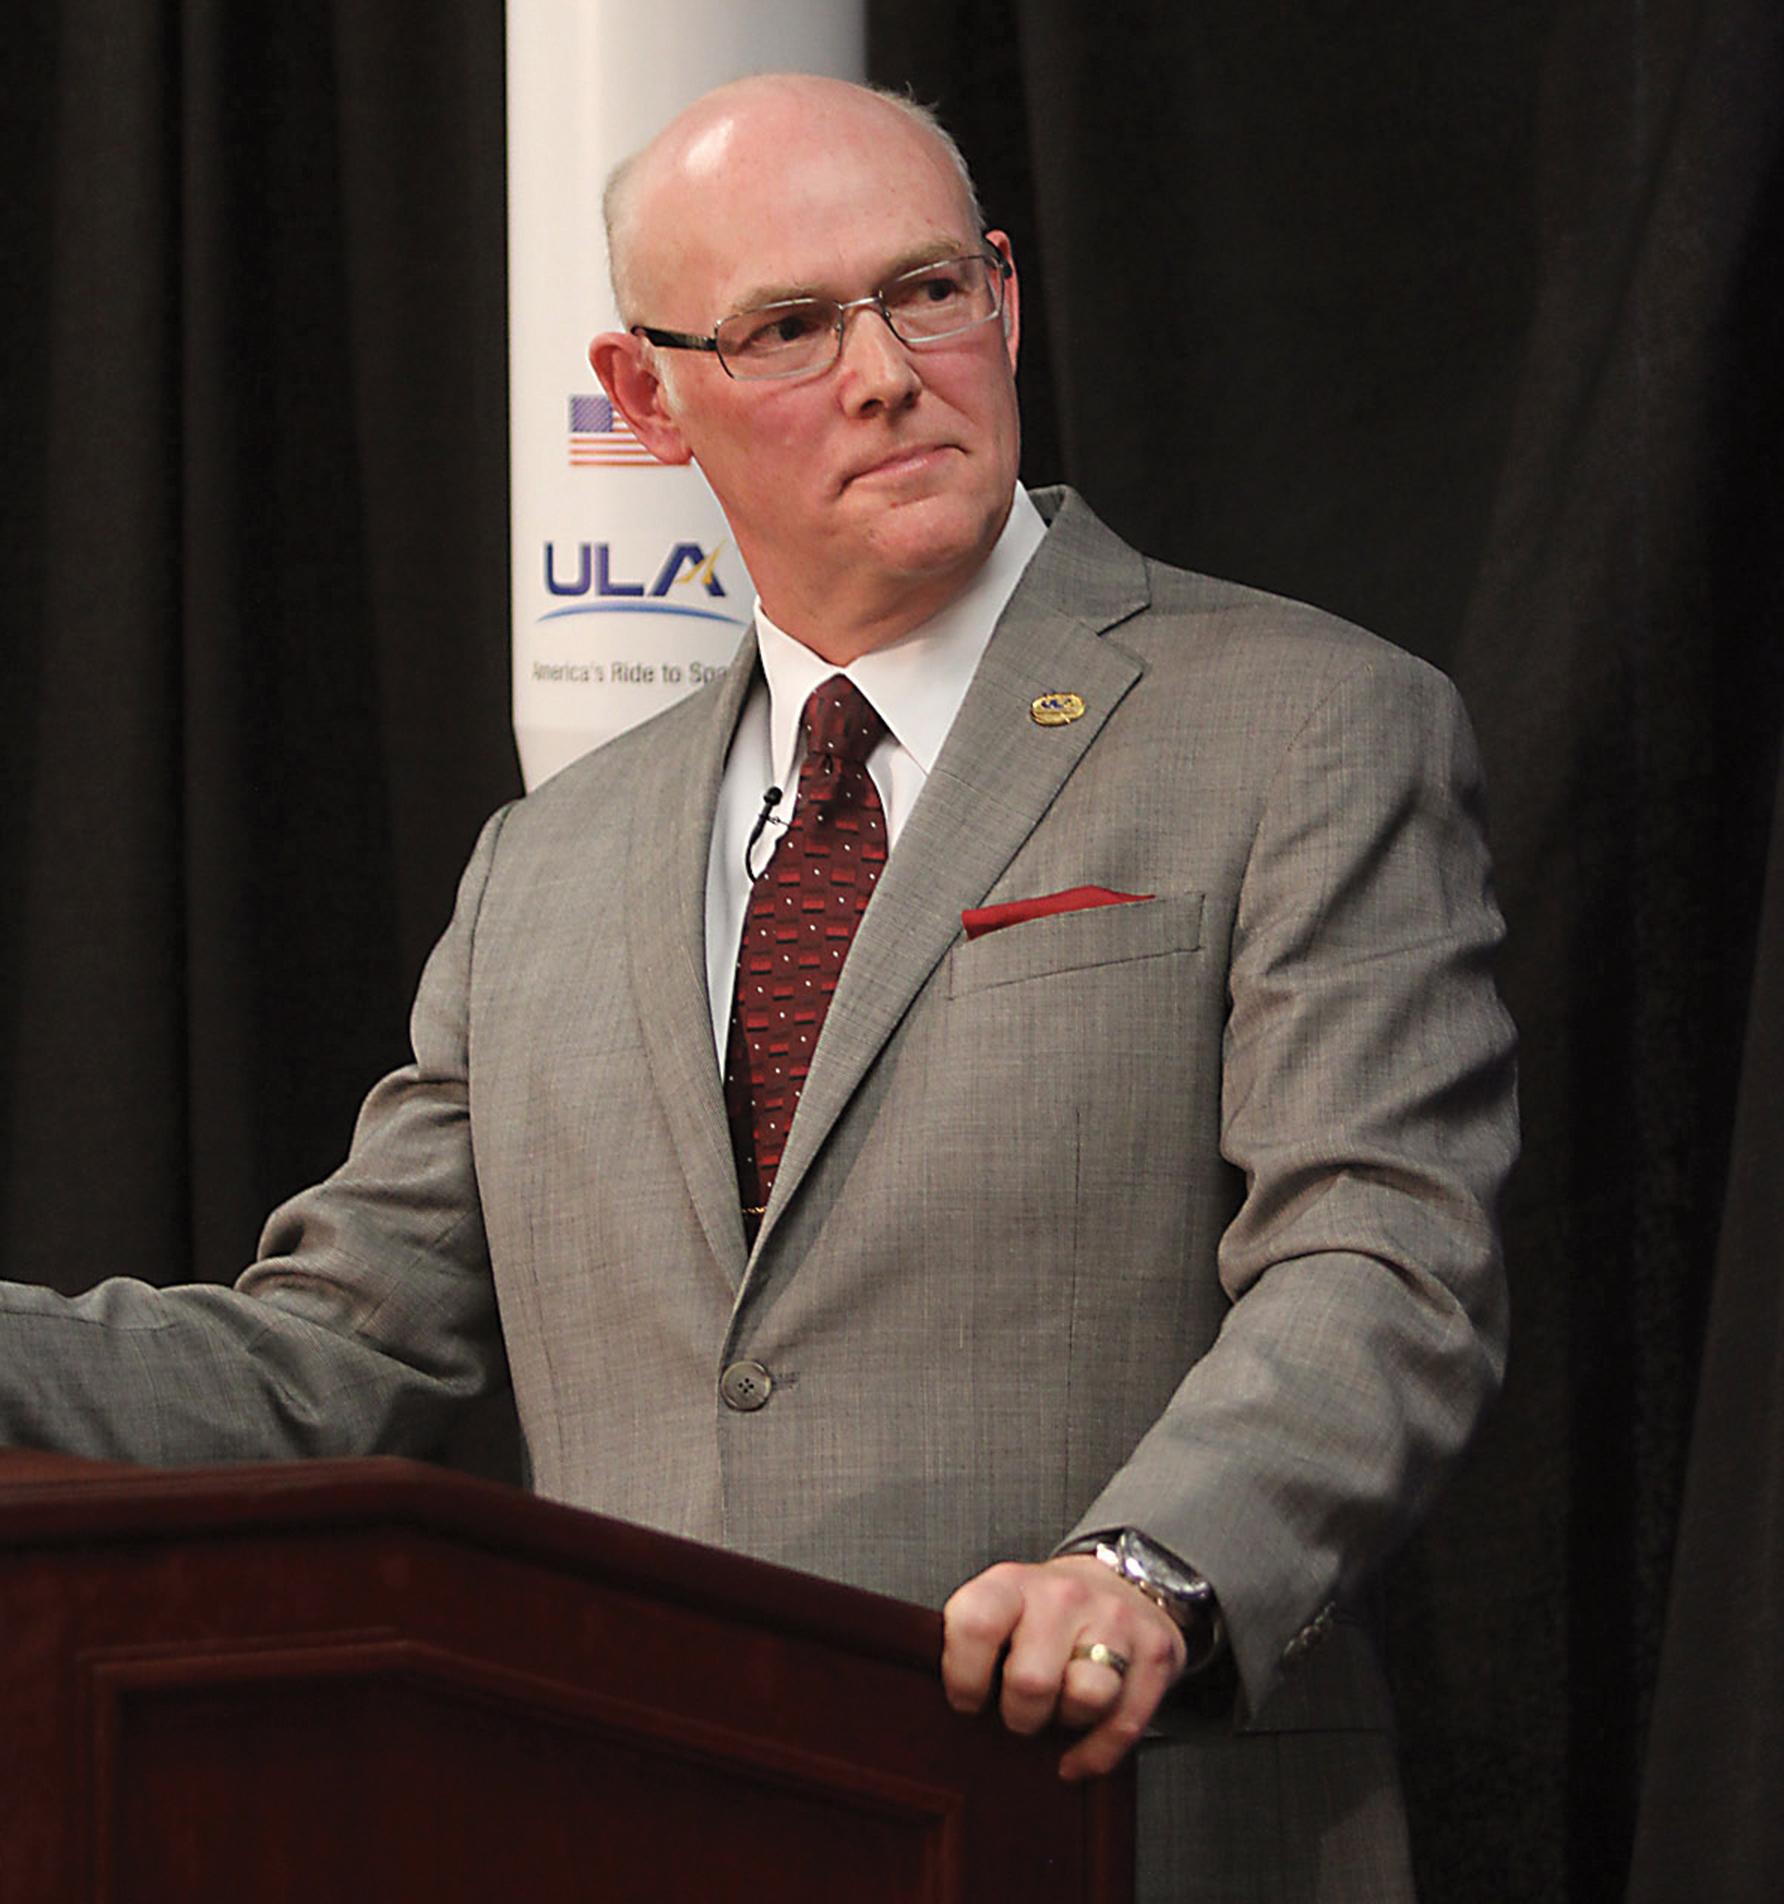 ULA CEO Tory Bruno